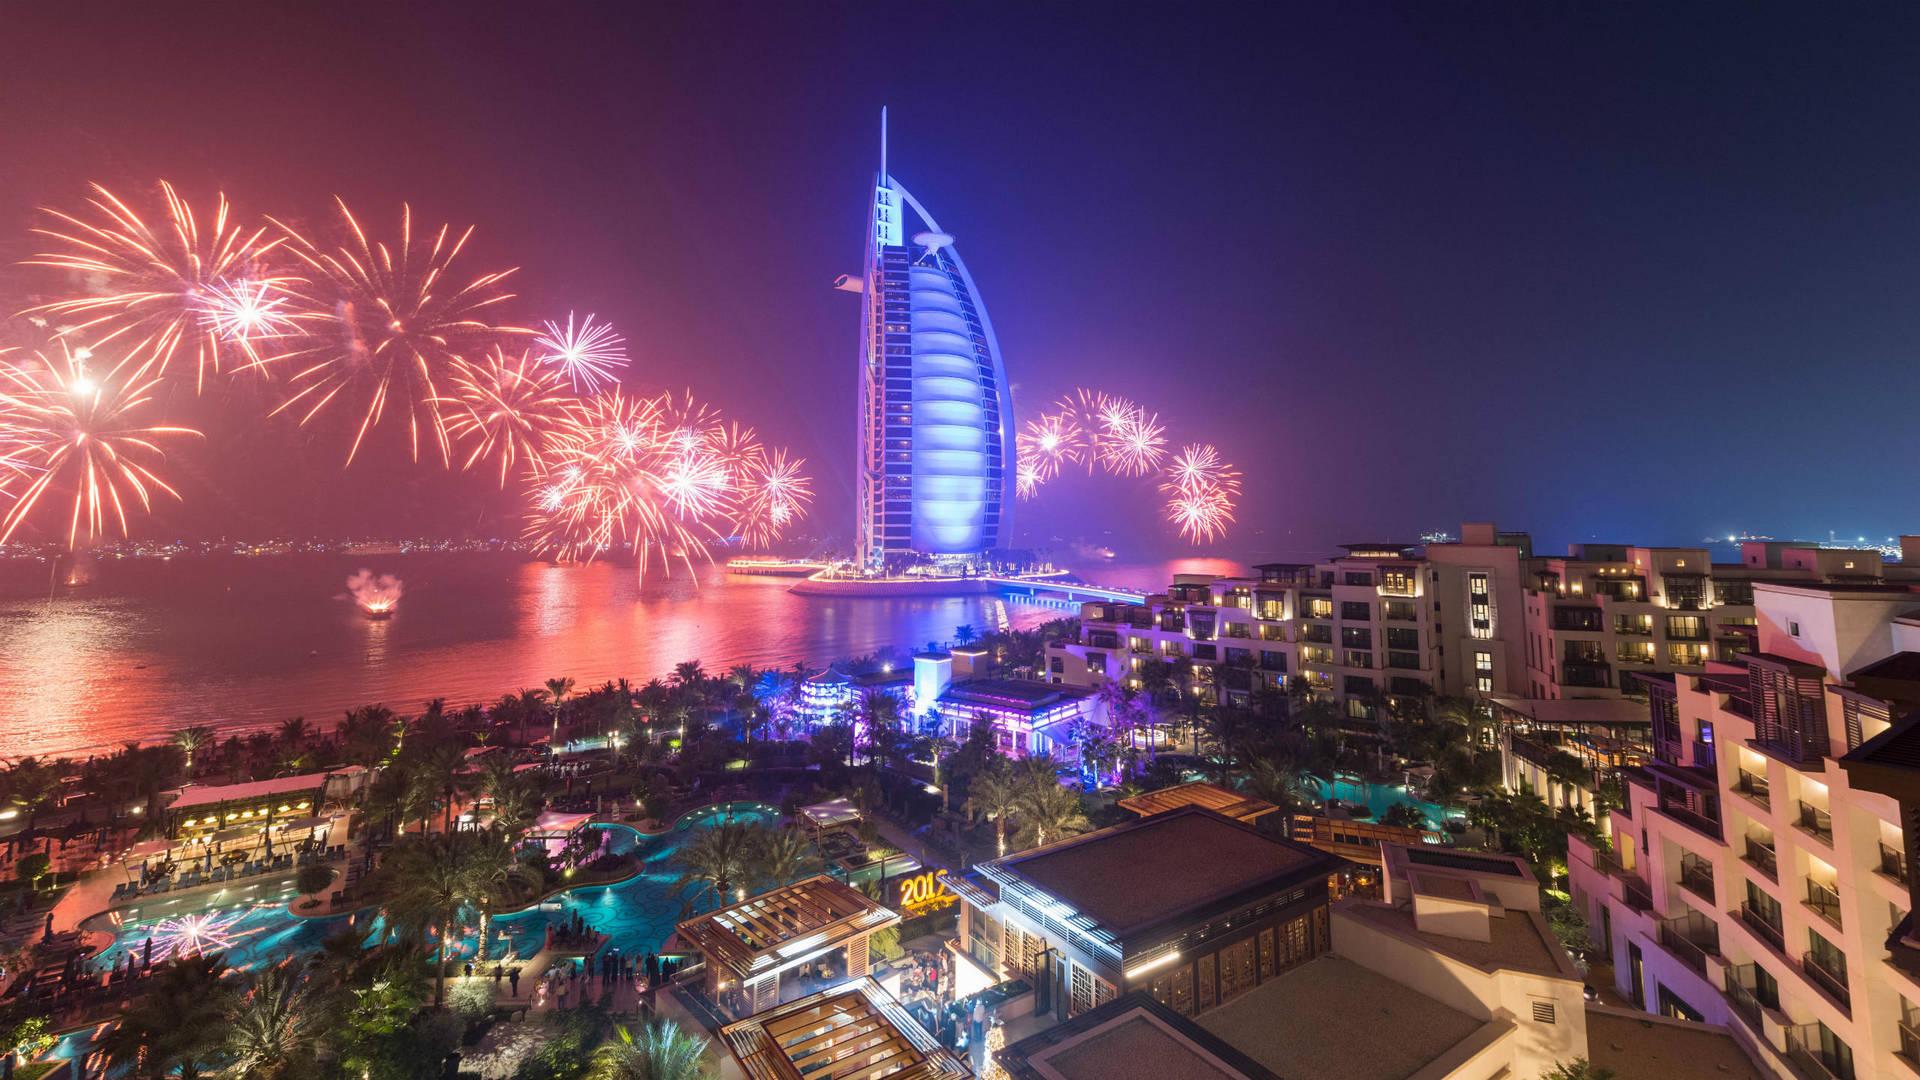 Burj Al Arab Fireworks New Year Eve